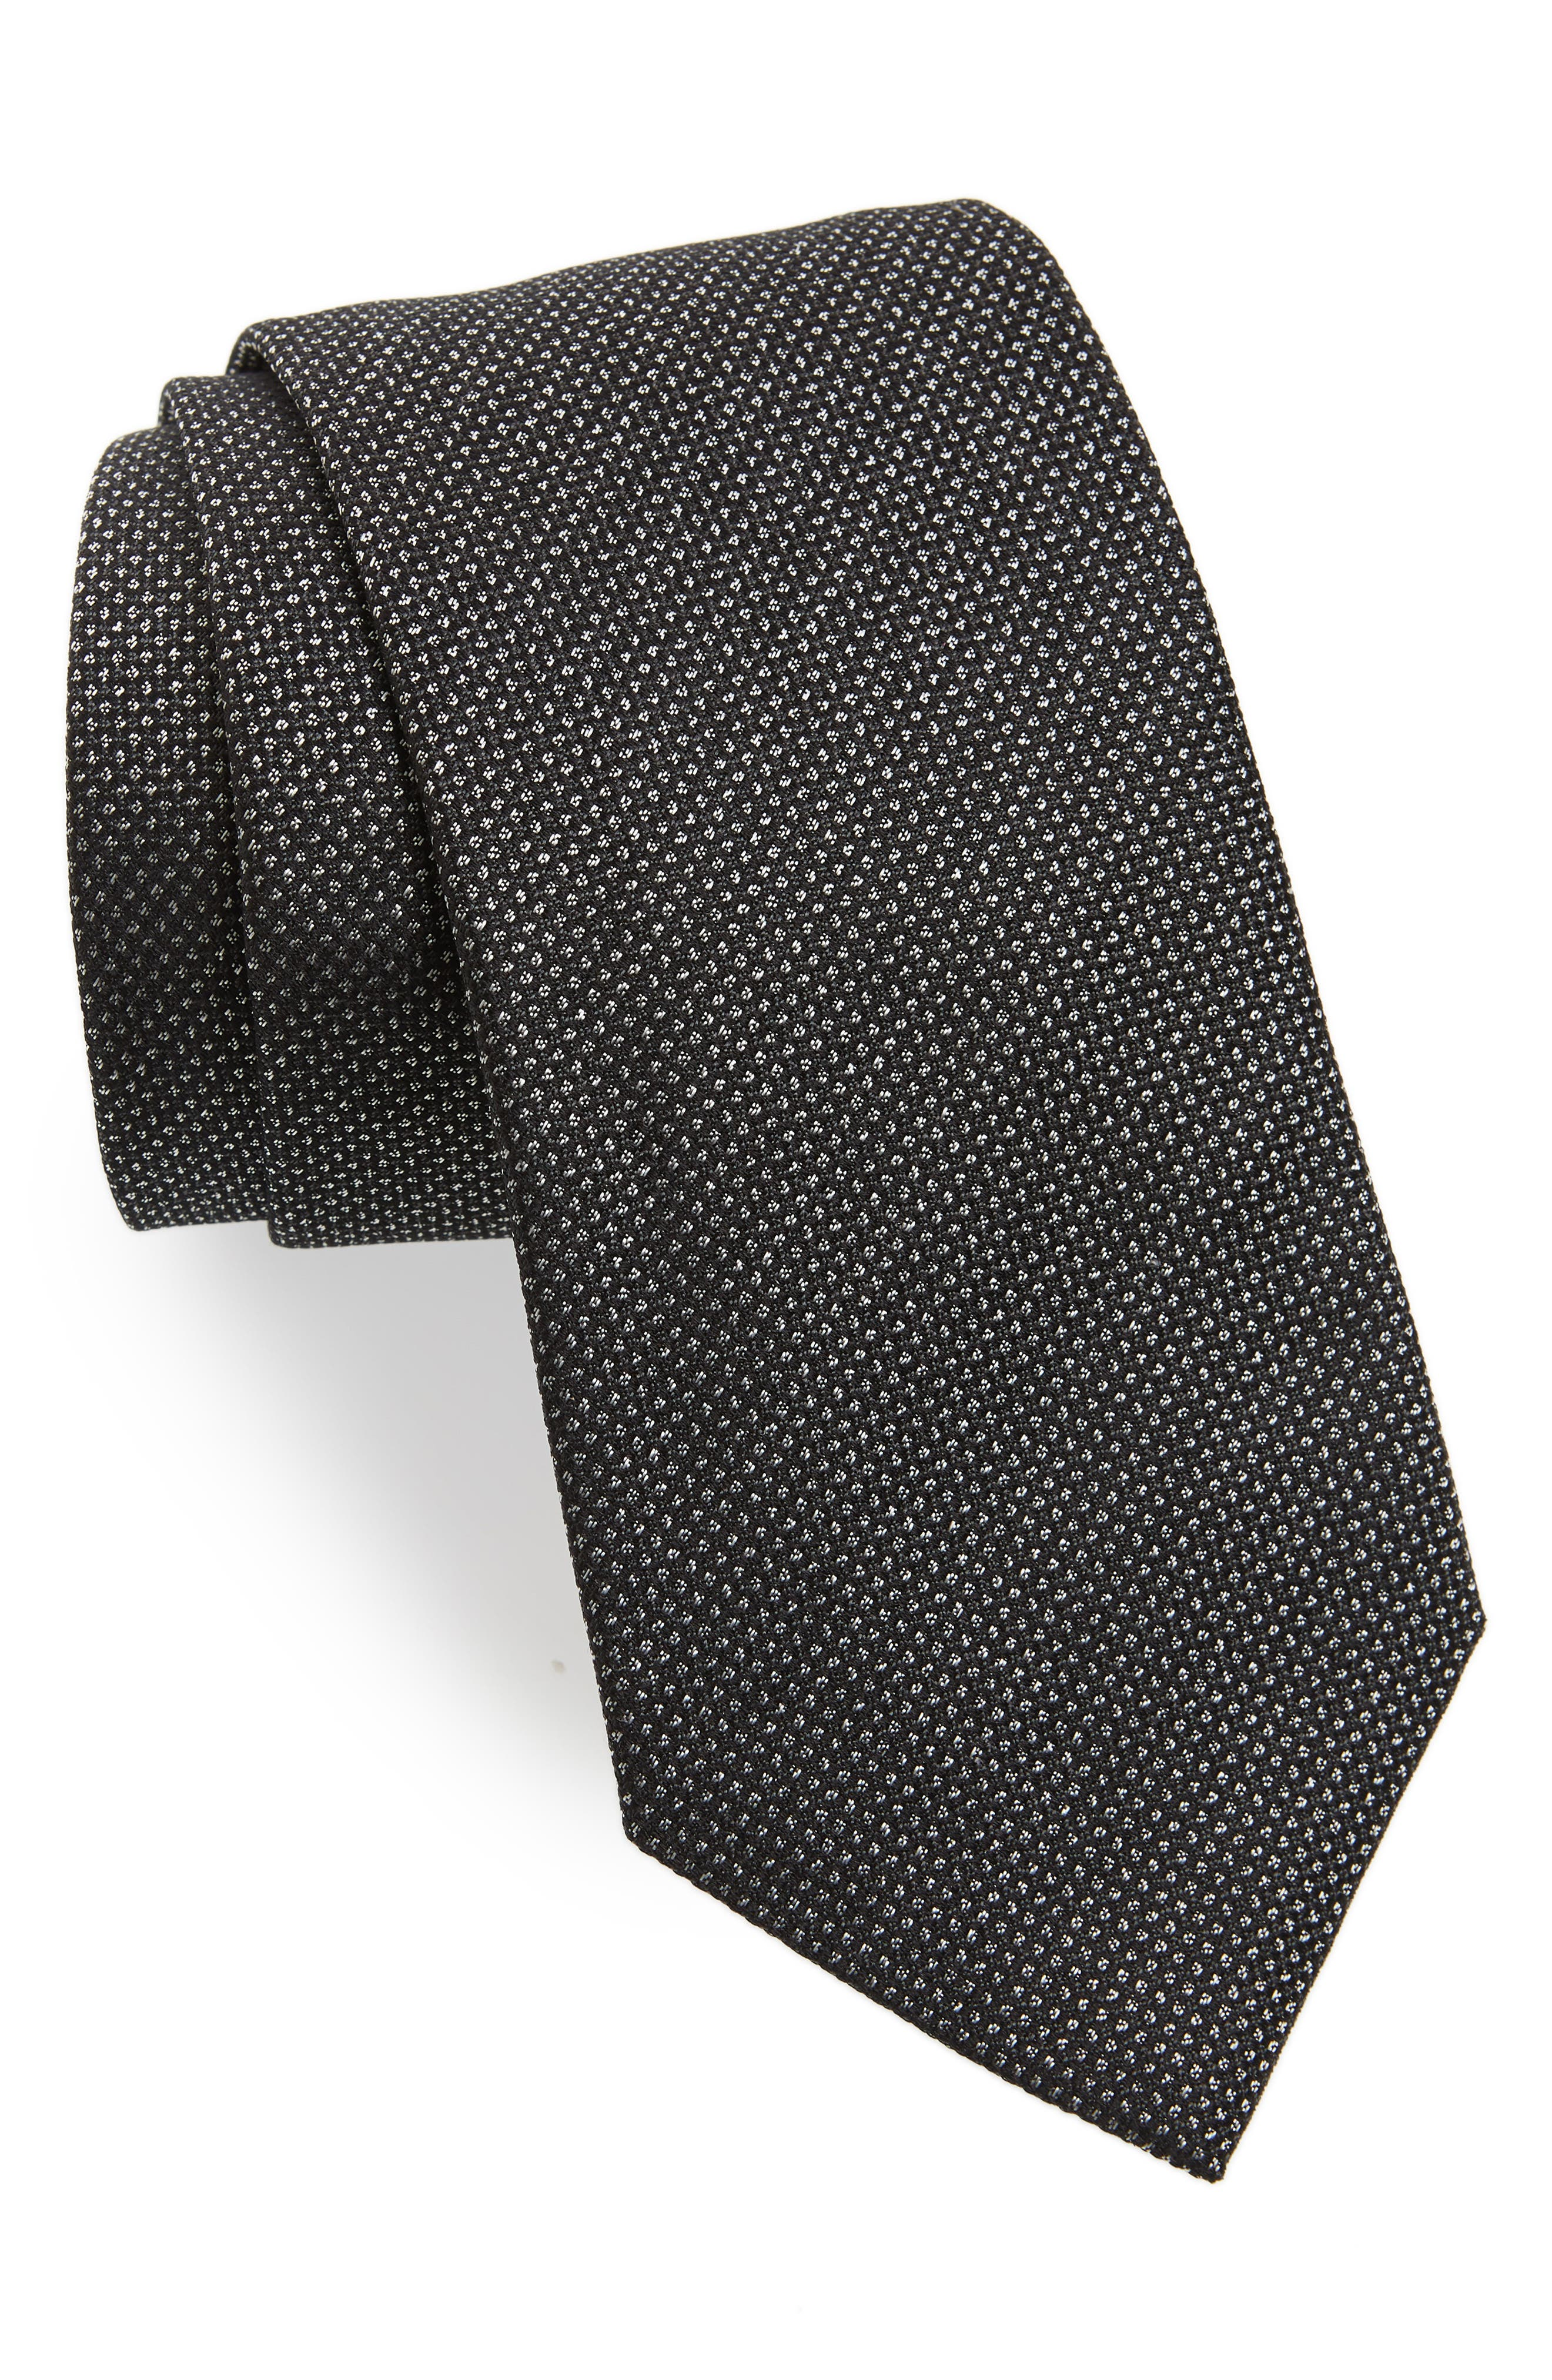 Dot Silk Tie,                             Main thumbnail 1, color,                             BLACK